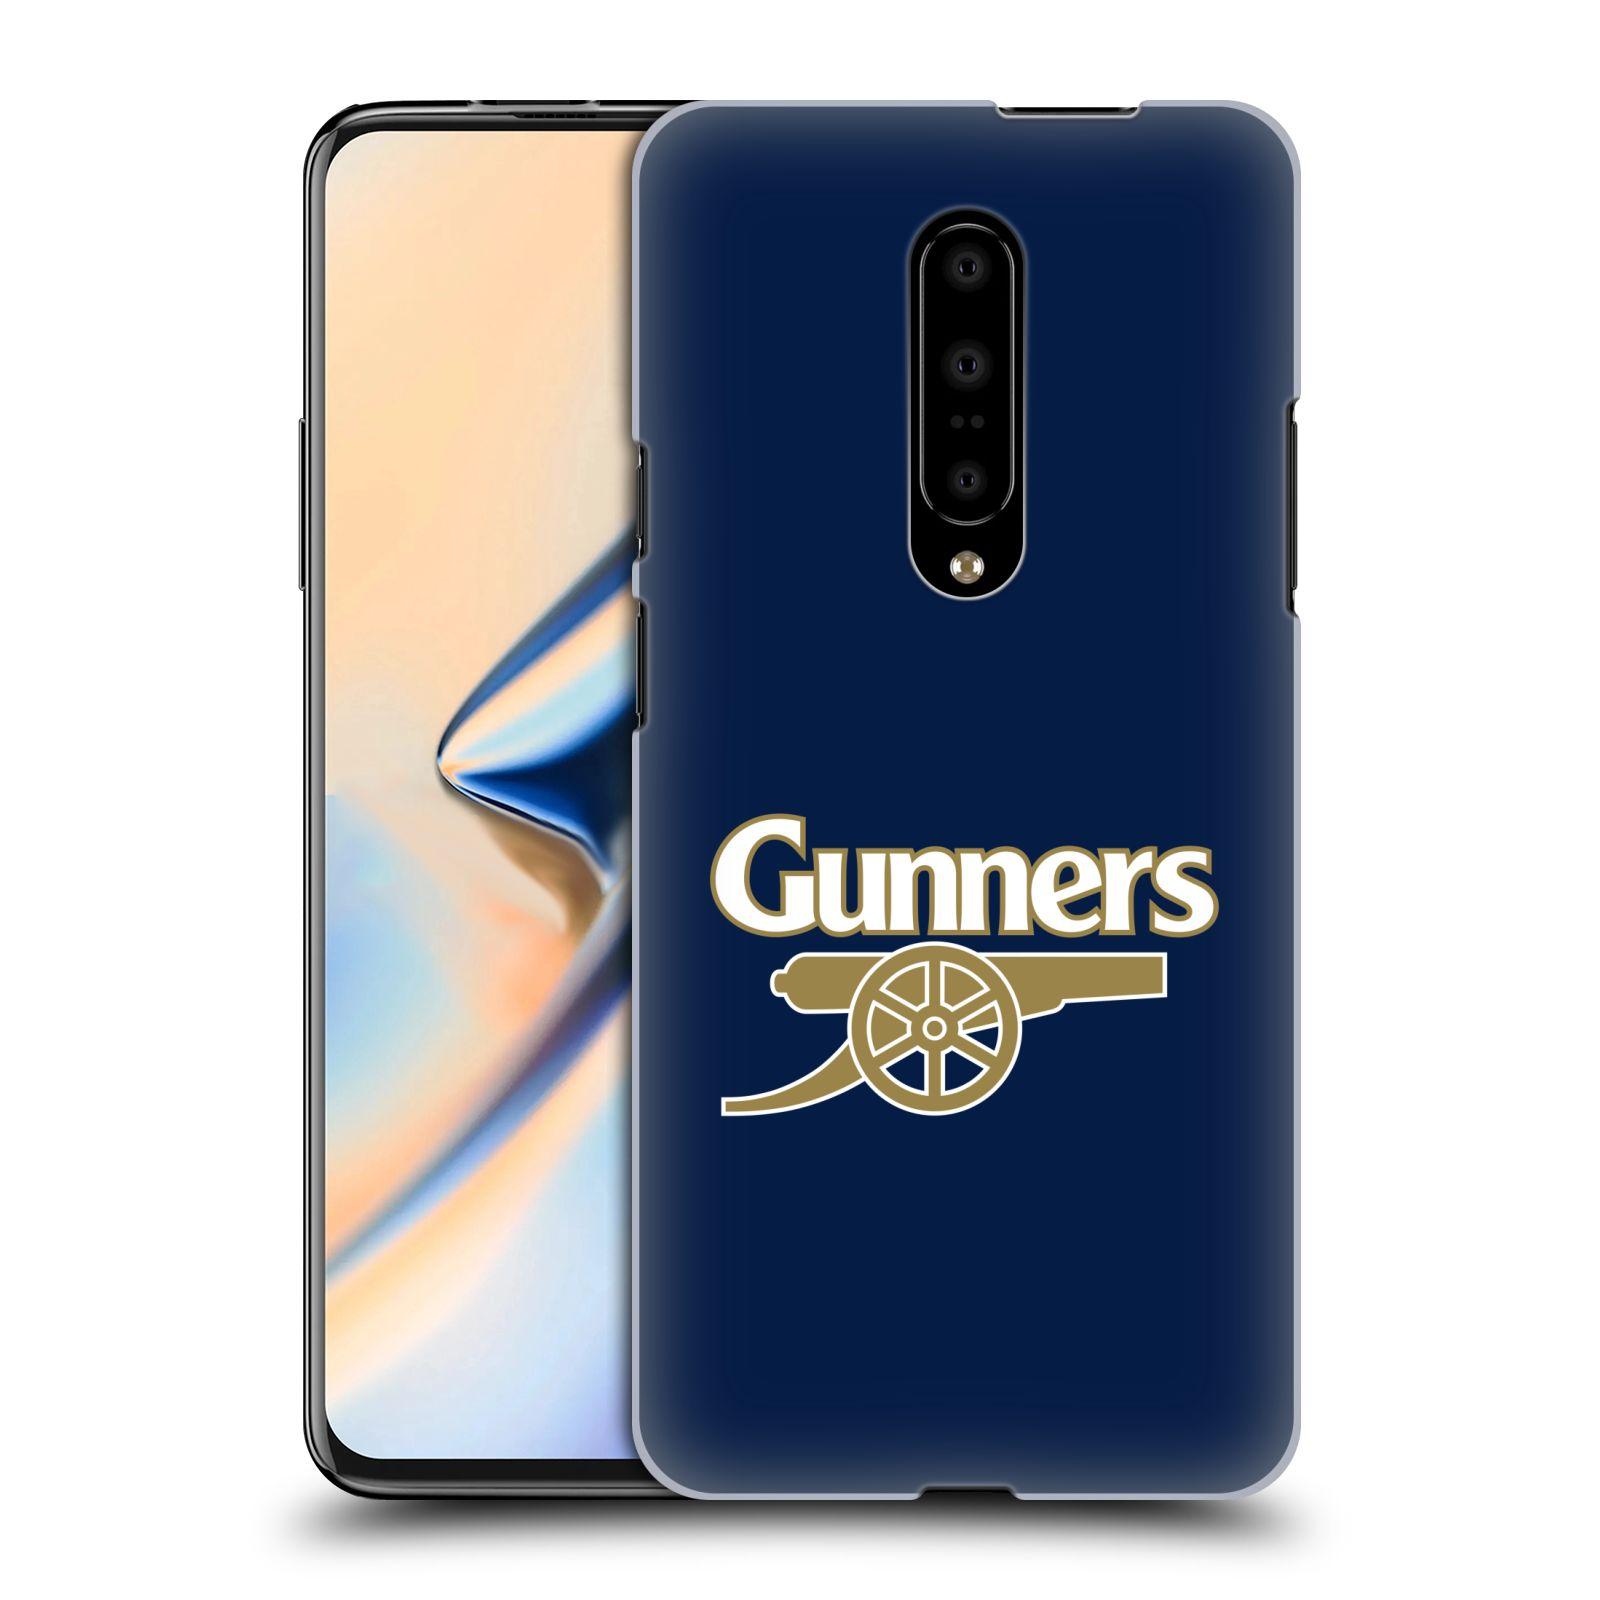 Plastové pouzdro na mobil OnePlus 7 - Head Case - Arsenal FC - Gunners